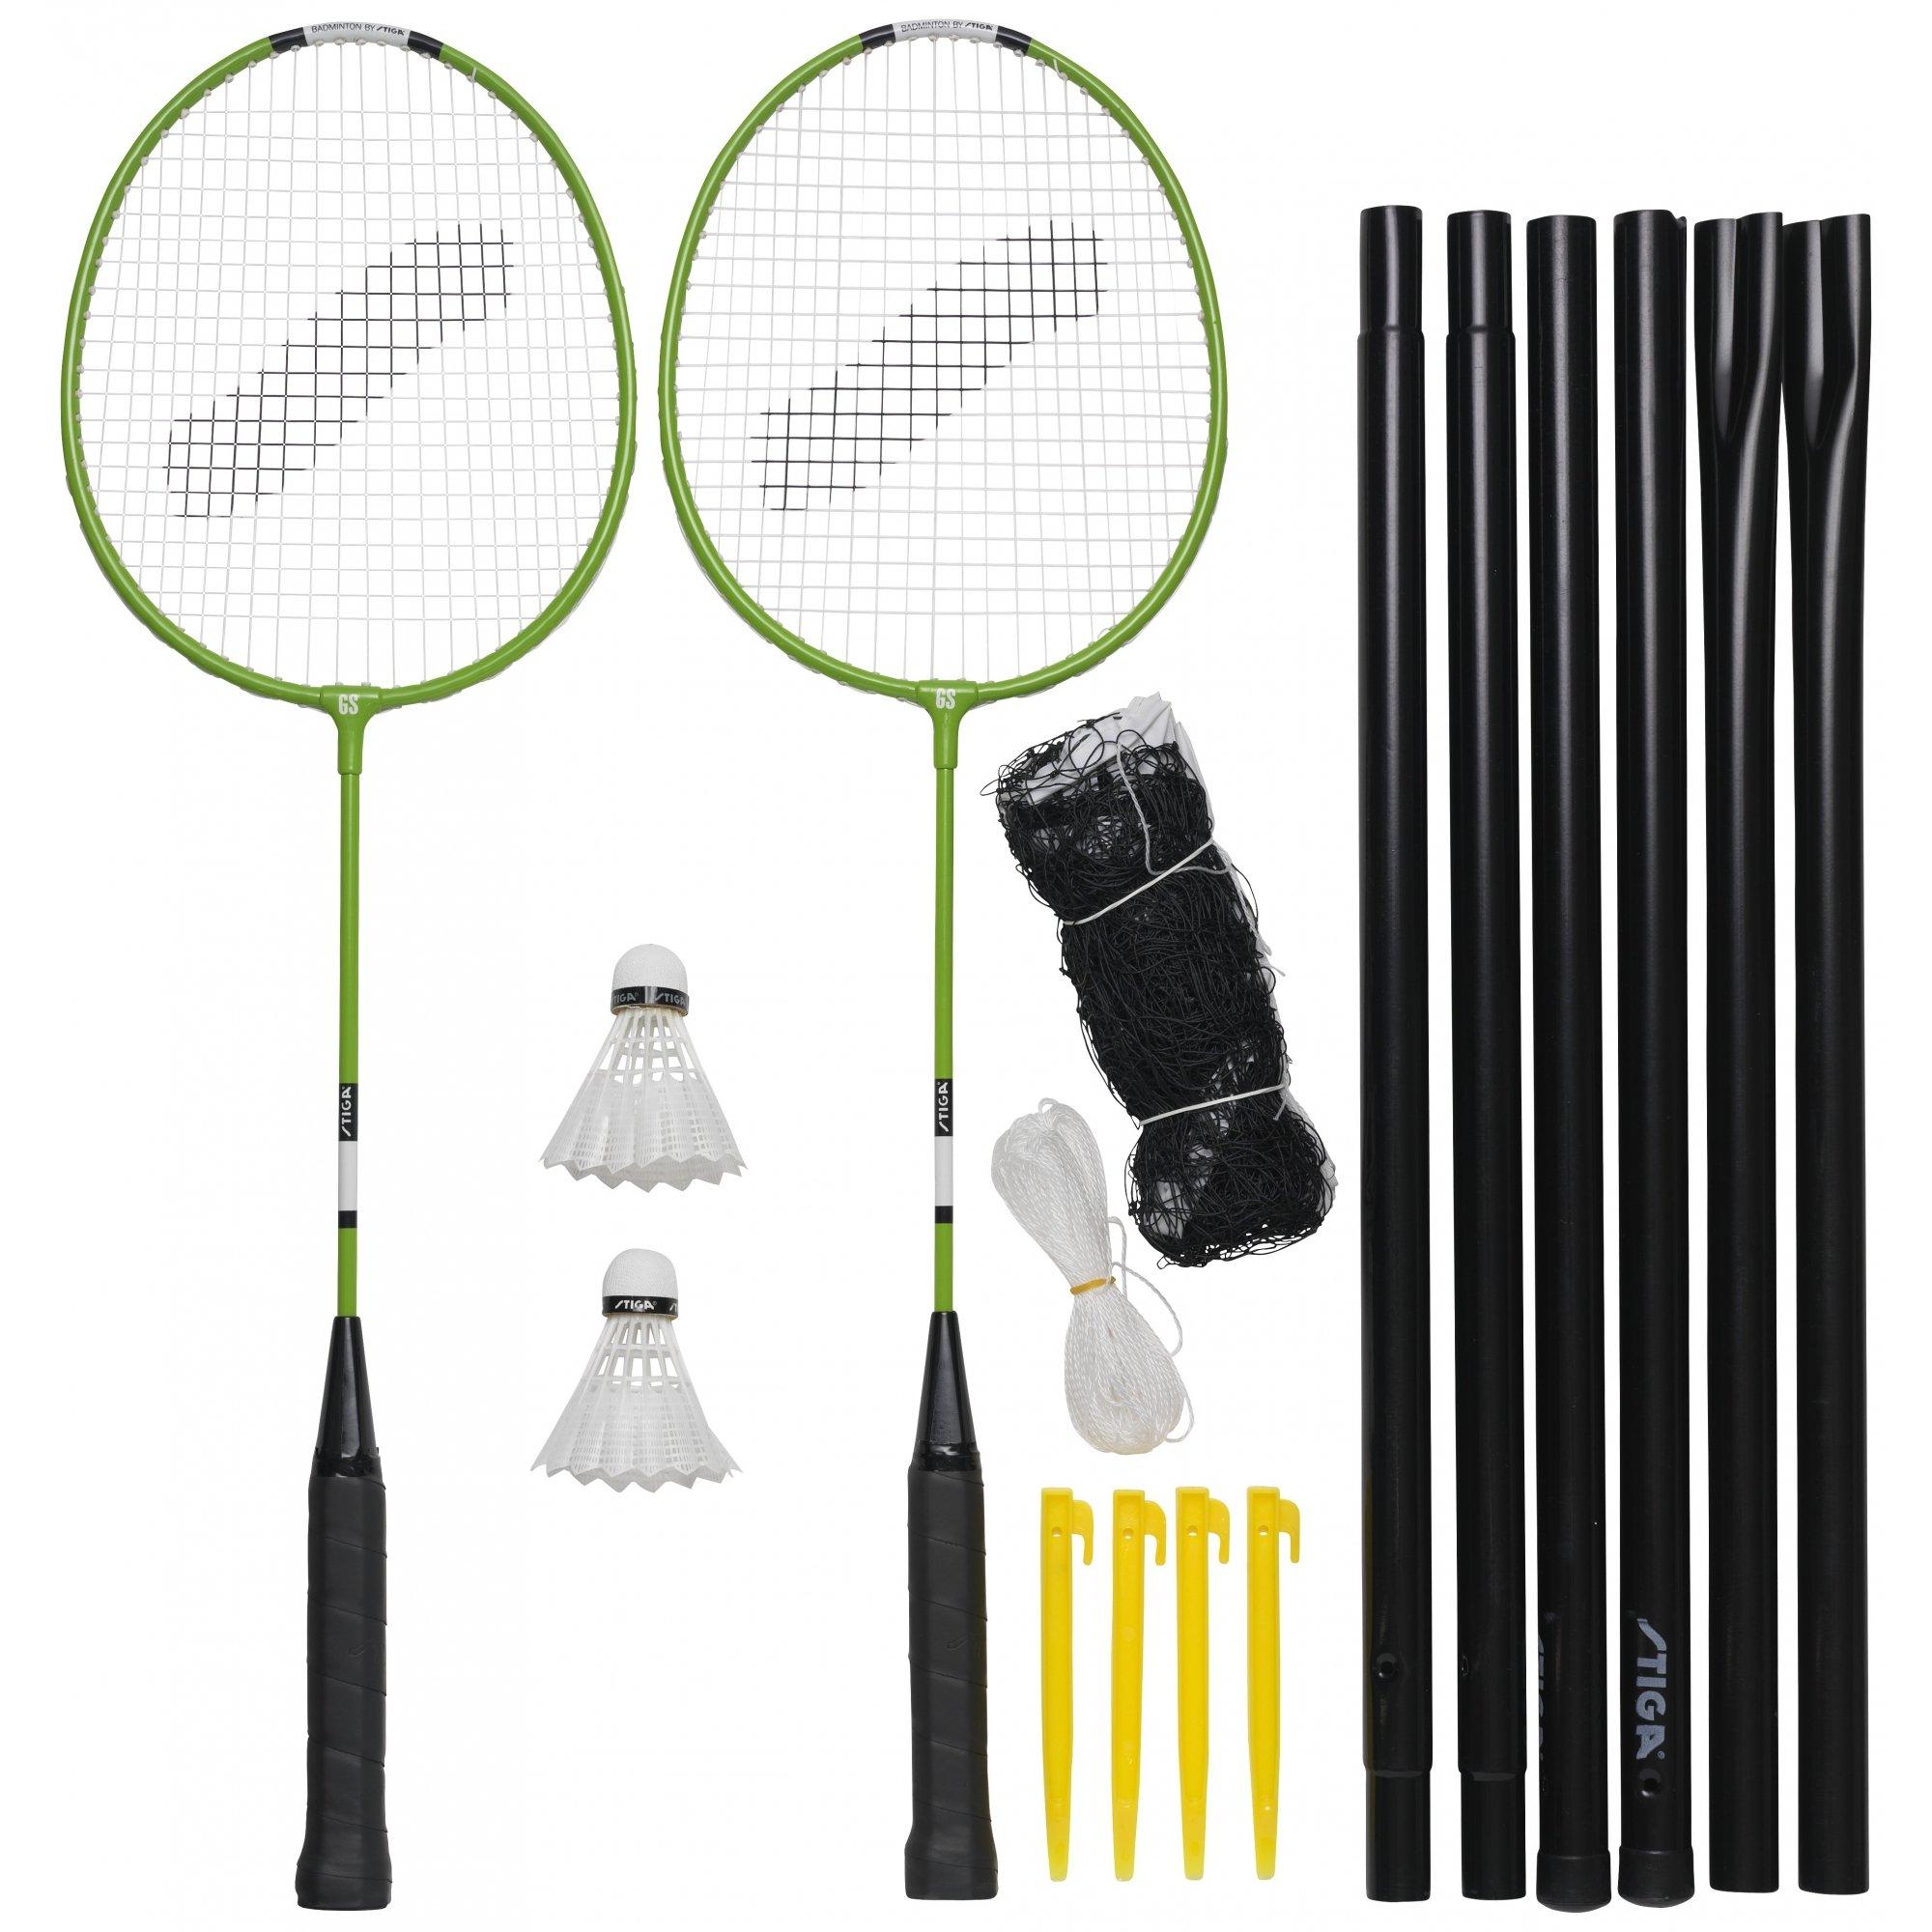 Badminton Stiga Garden Gs, Stiga Comet Kit